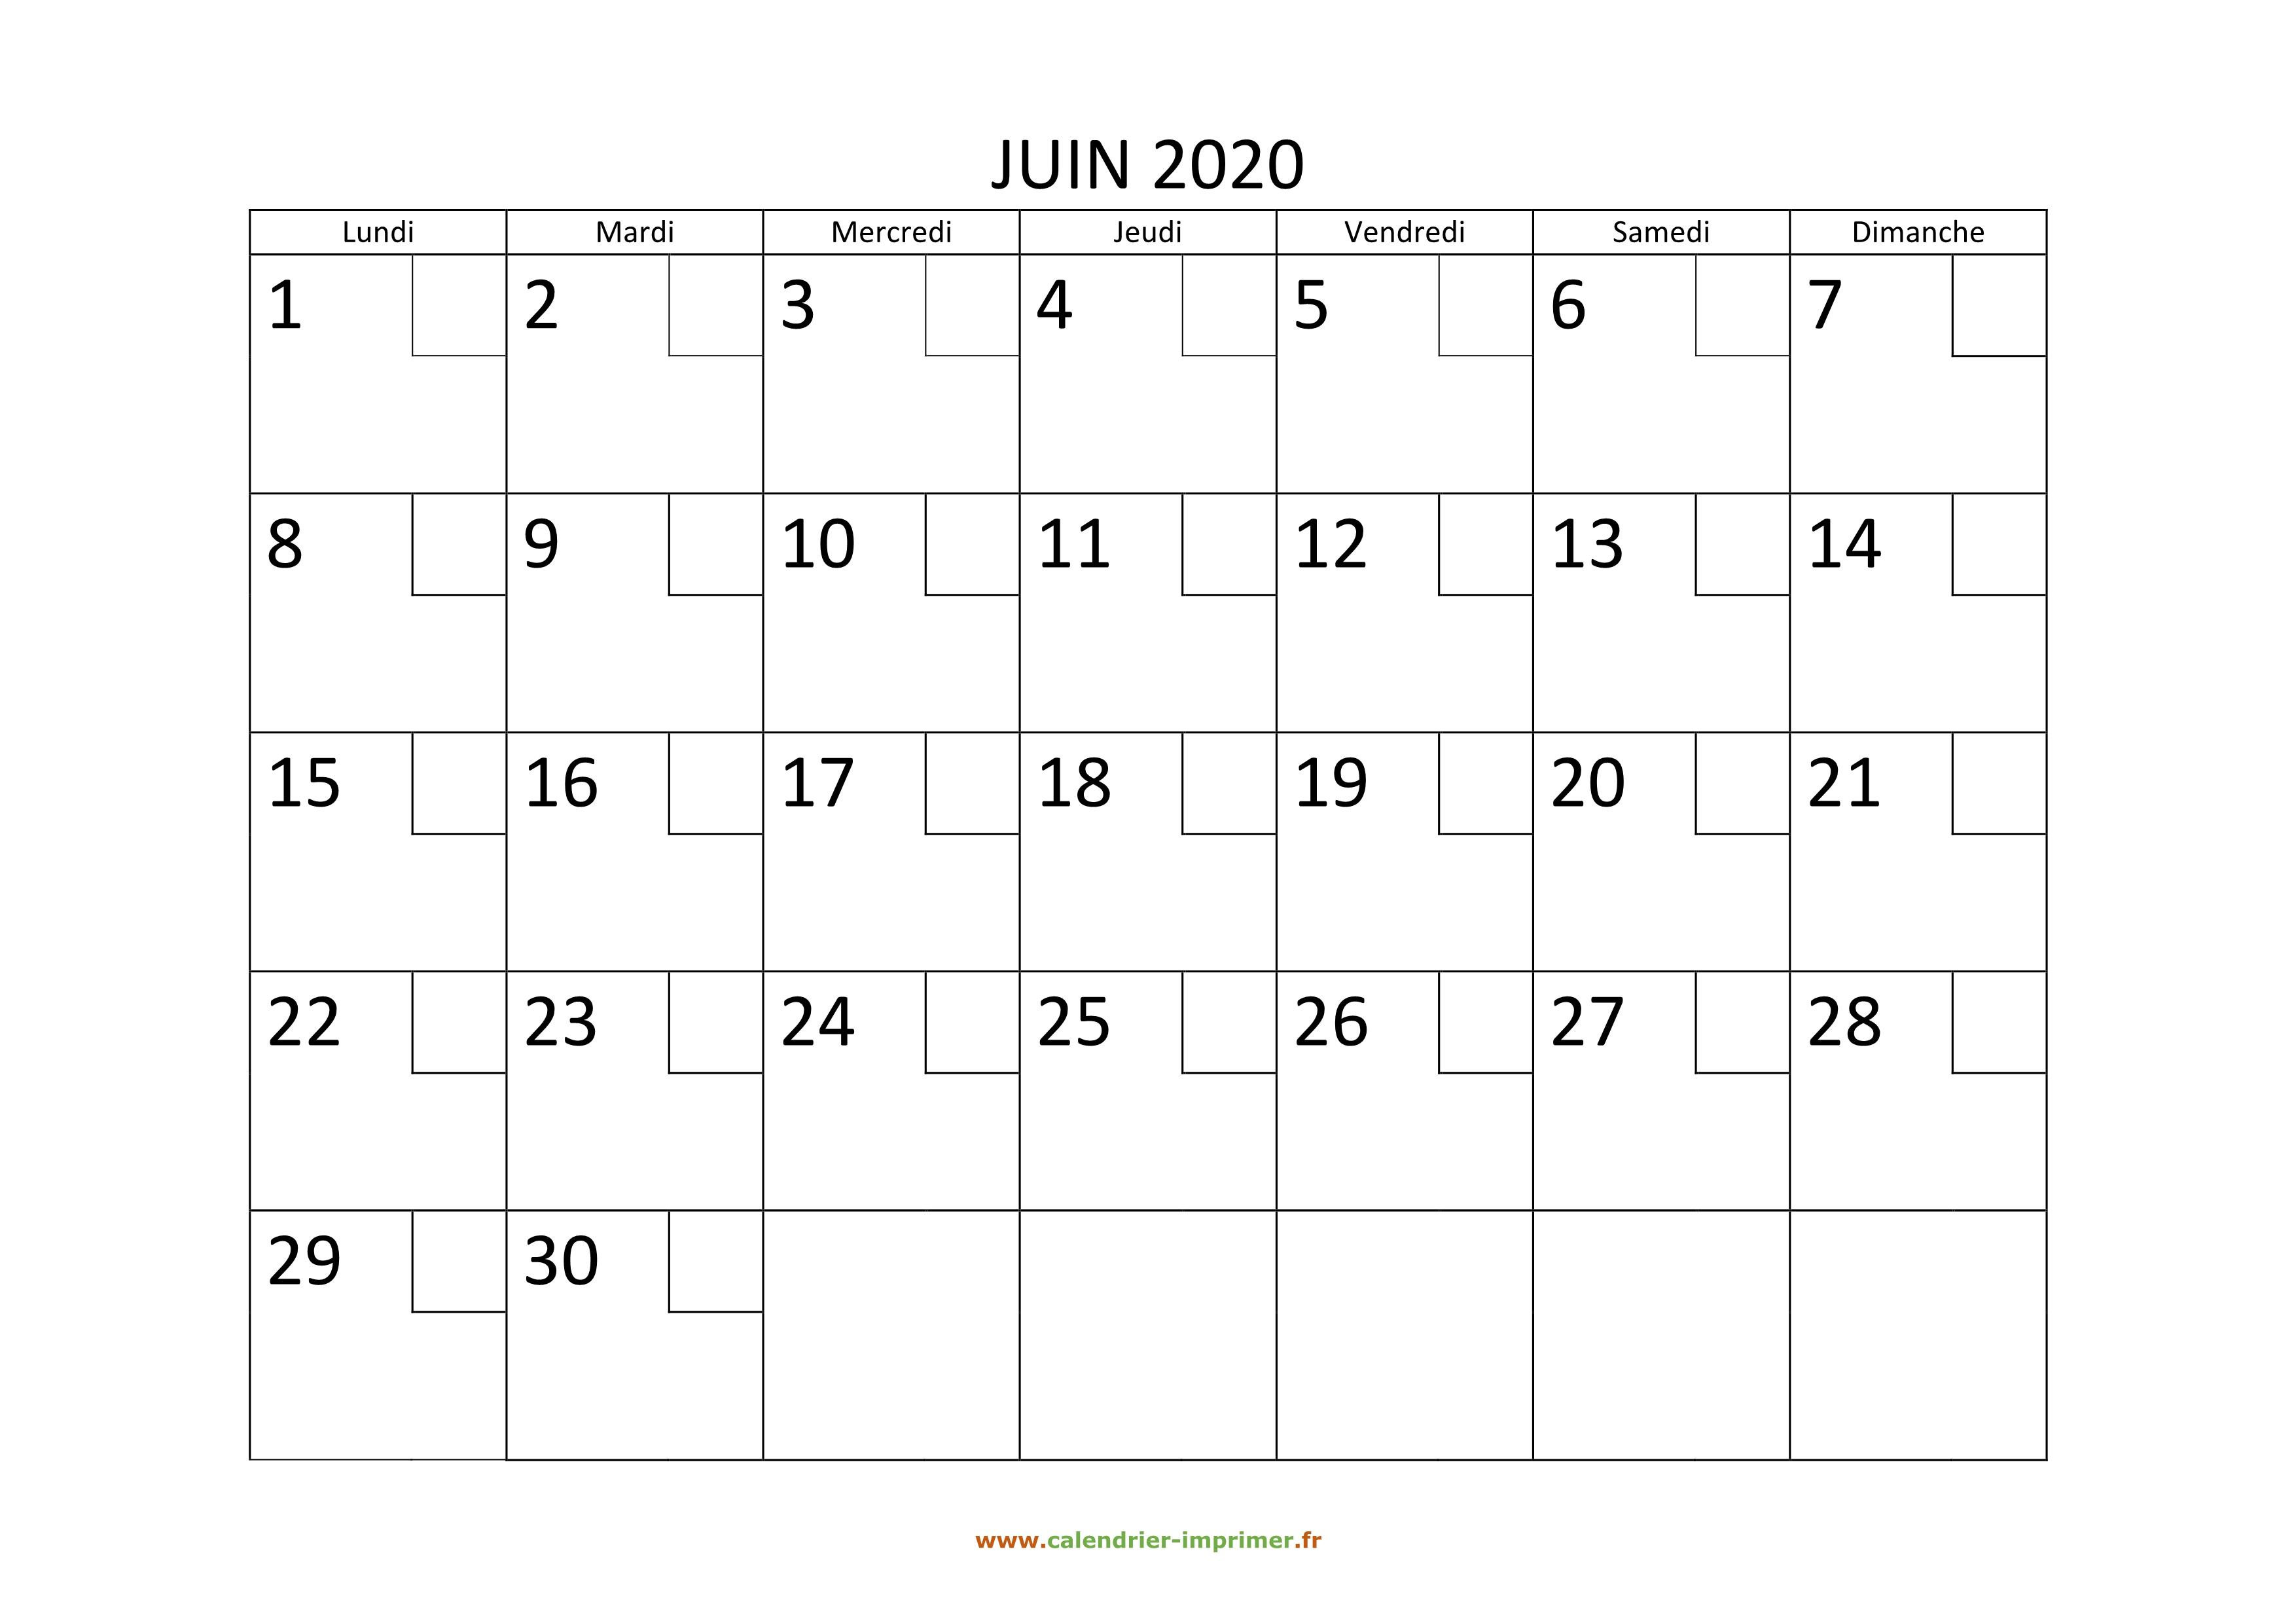 Calendrier Juin 2020 à Imprimer.Calendrier Juin 2020 A Imprimer